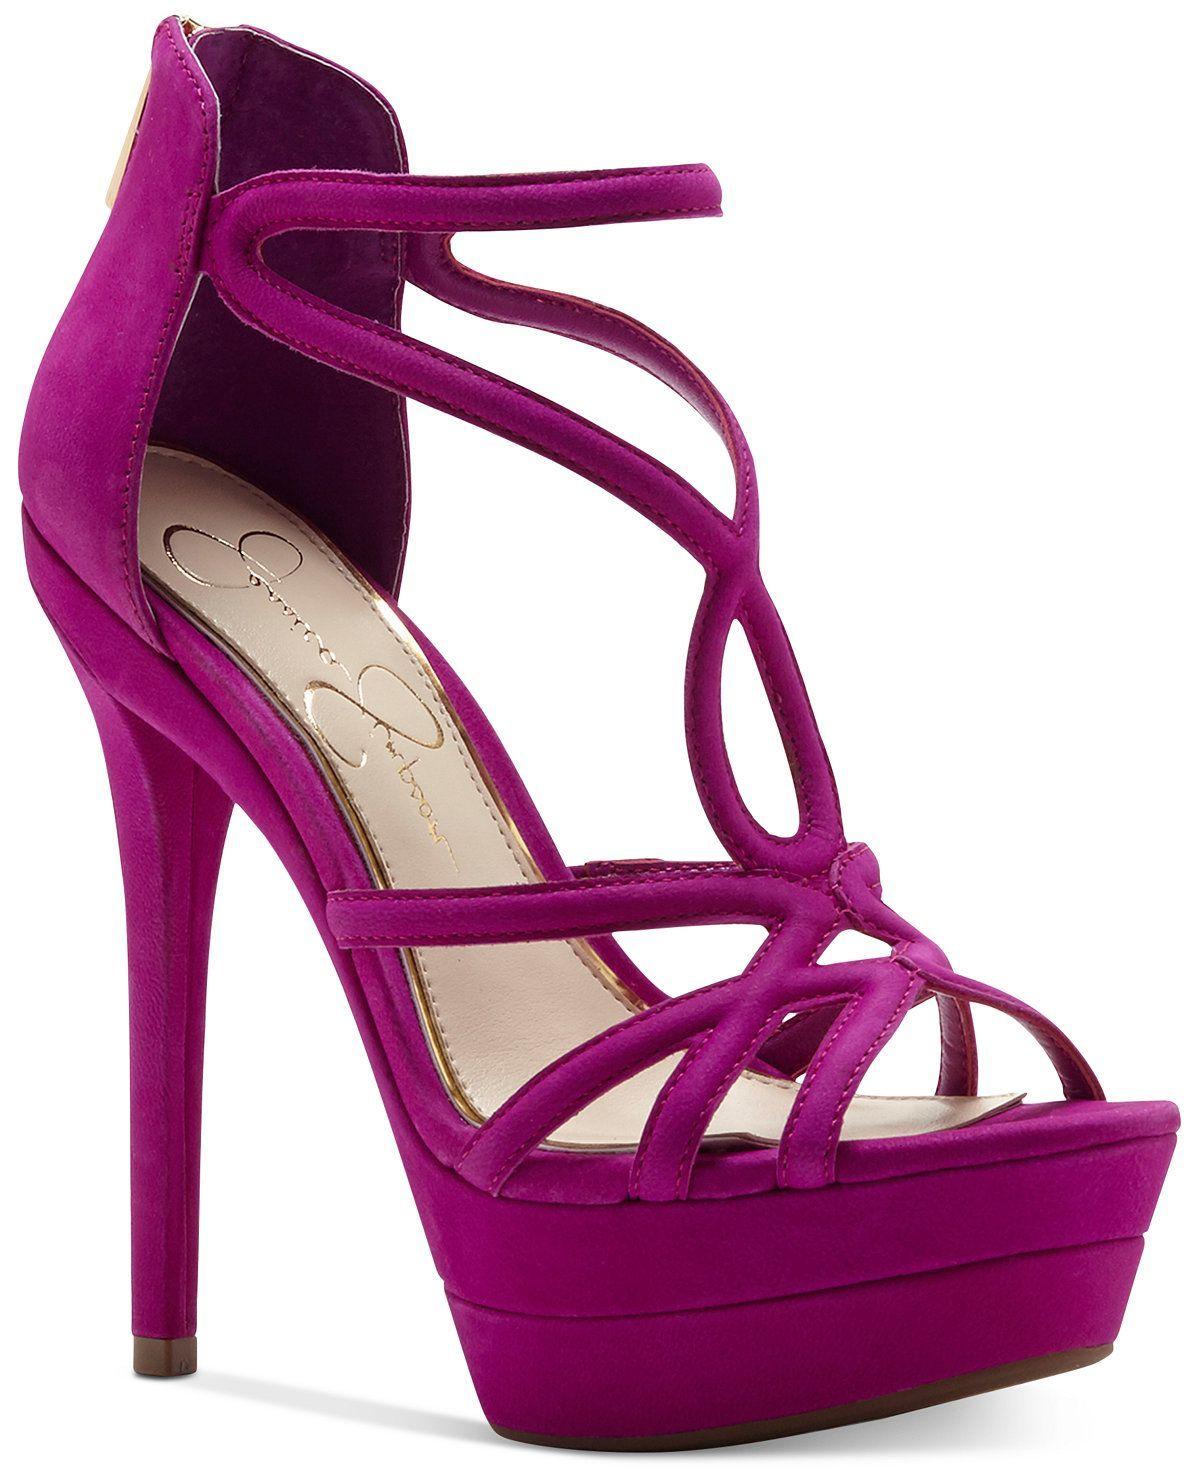 ebd8084b0828 Jessica Simpson Rozmari T-Strap Platform Sandals - Sandals - Shoes - Macy s   tstrapshoes